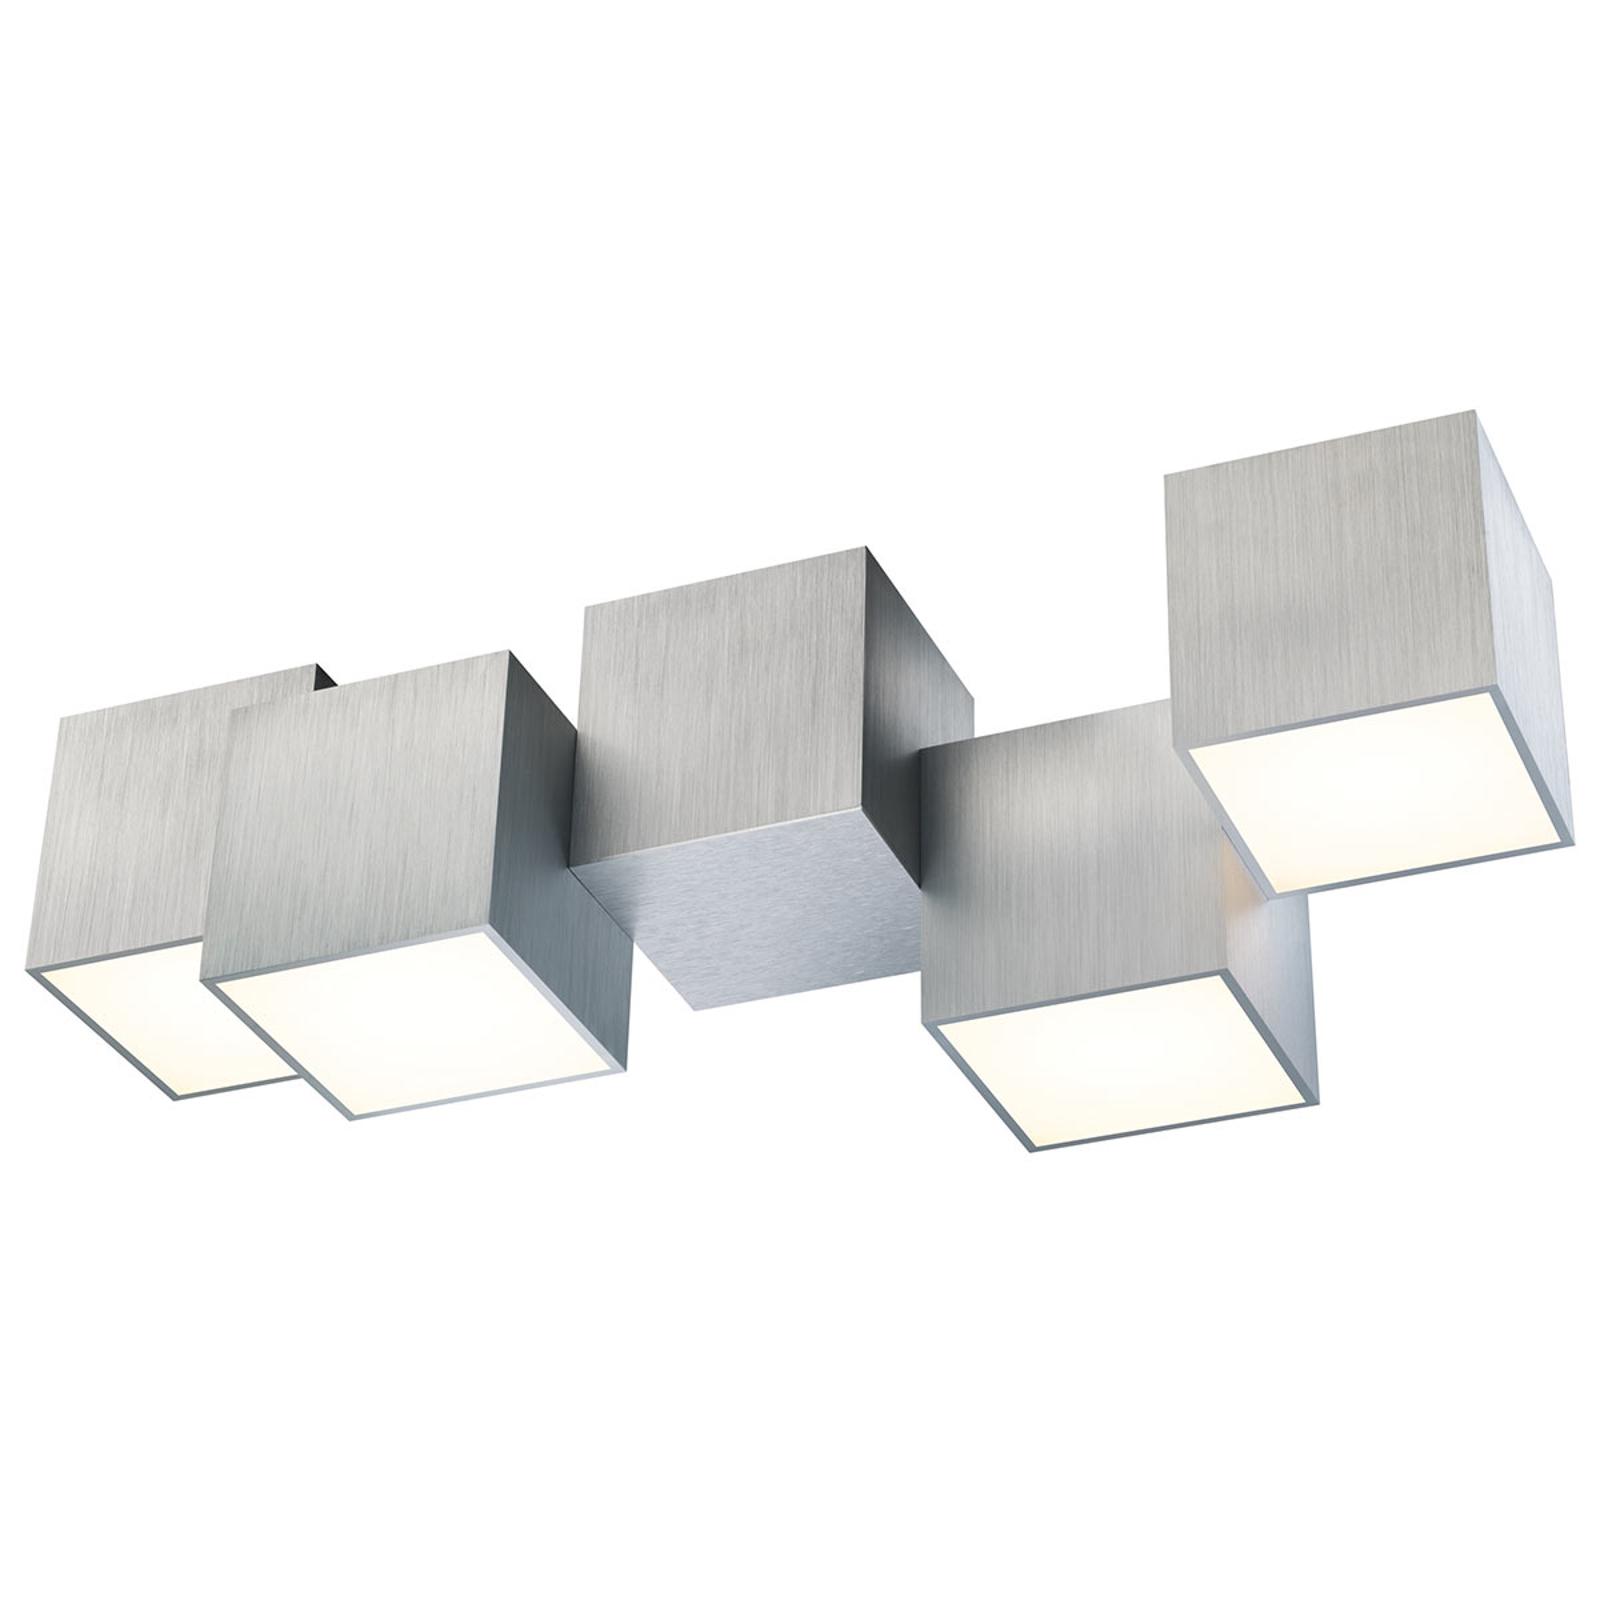 GROSSMANN Rocks lampa sufitowa LED, 4-punktowa